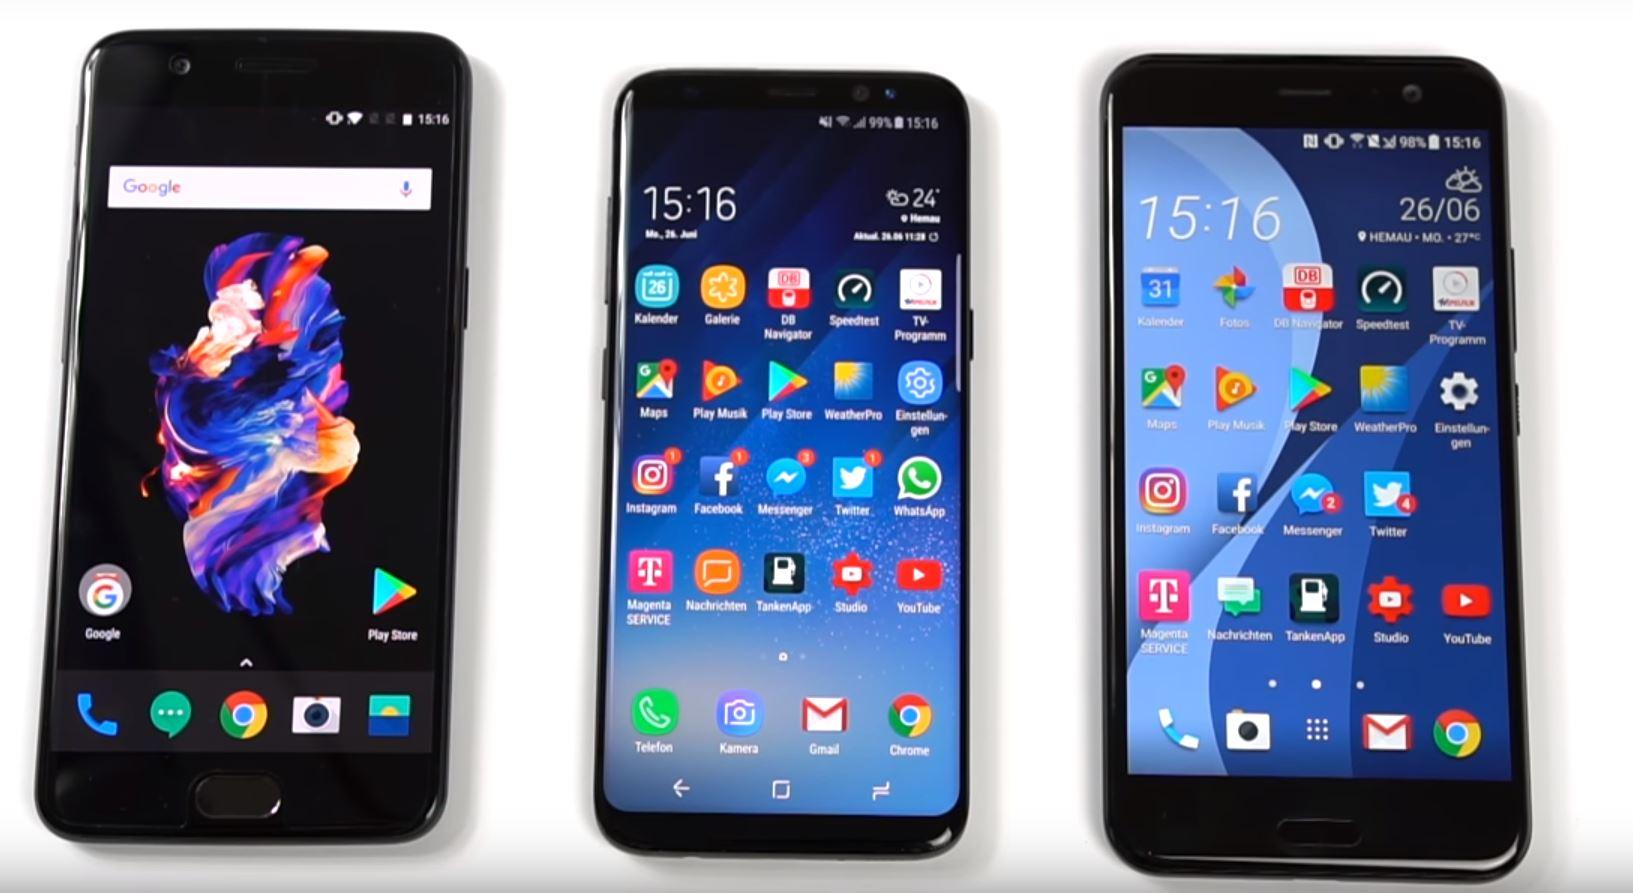 Gutes Smartphone Bis 100EUR